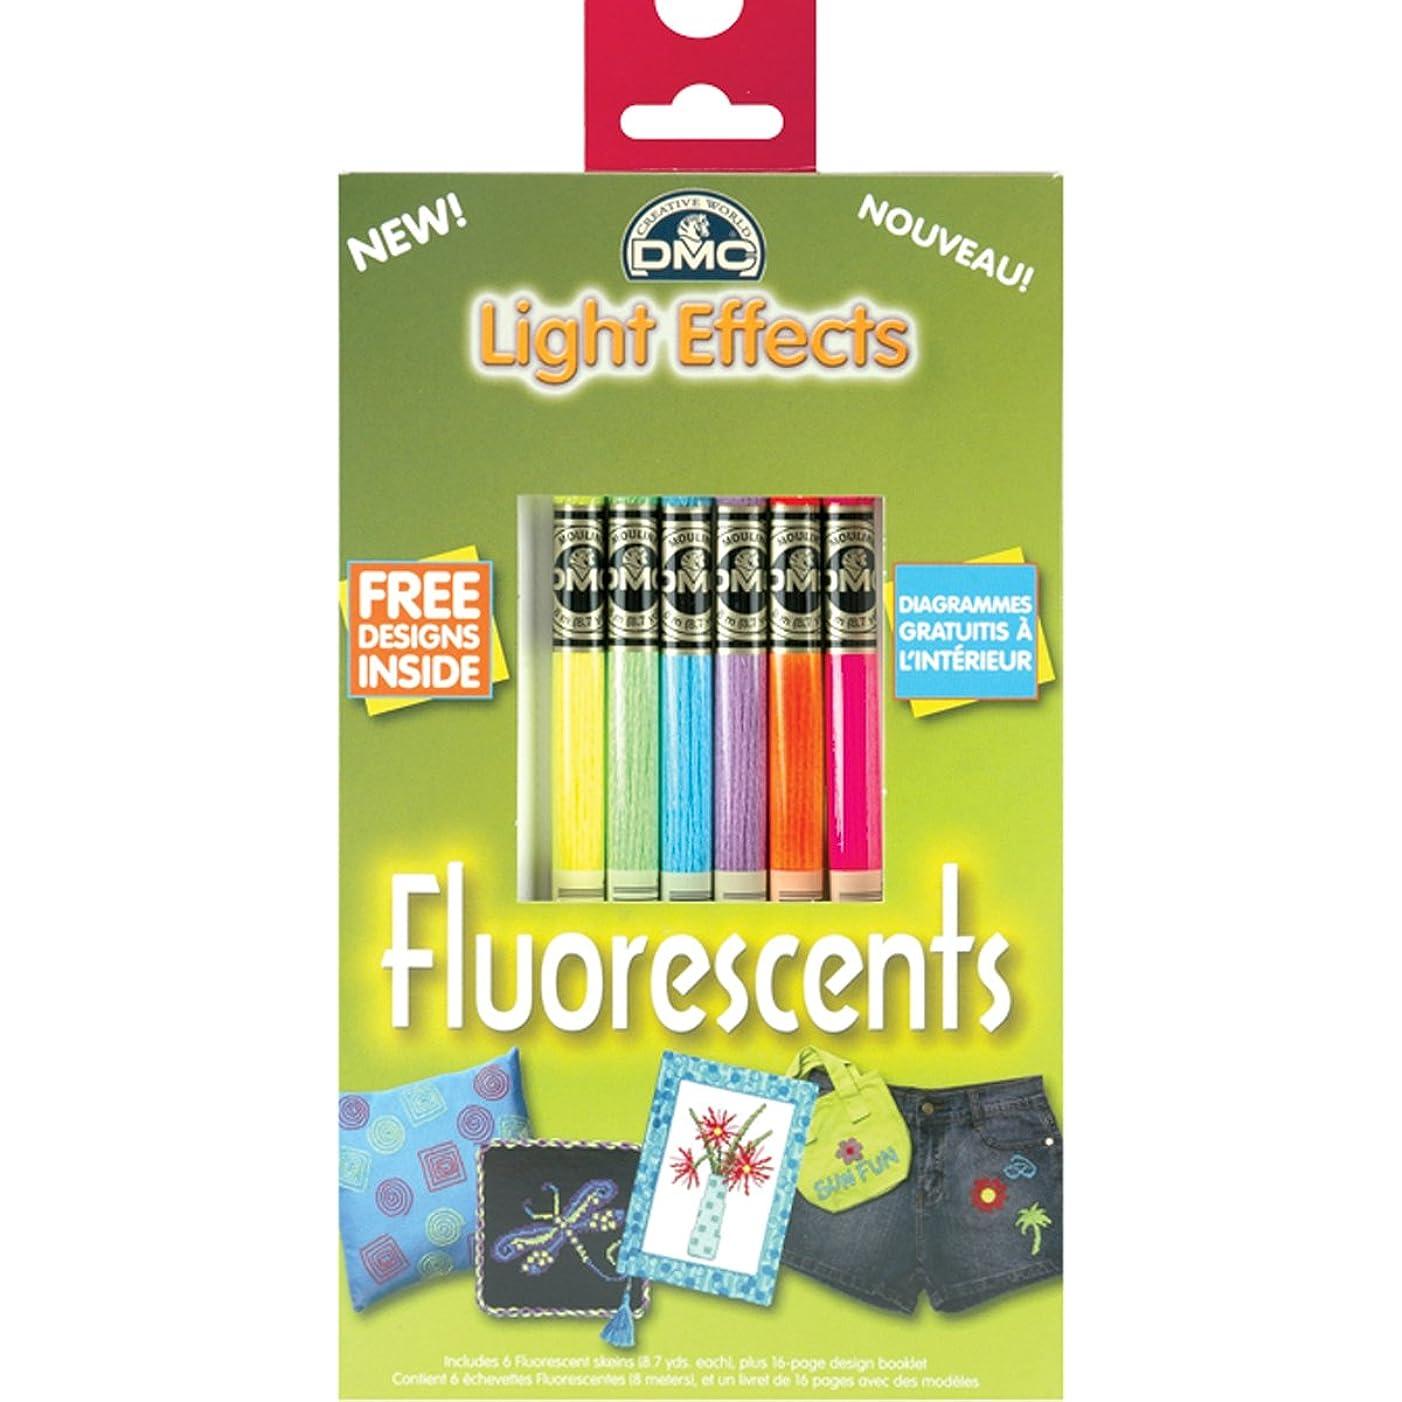 DMC 317WPK3 Light Effects Polyester Embroidery Floss, 8.7-Yard, Fluorescent